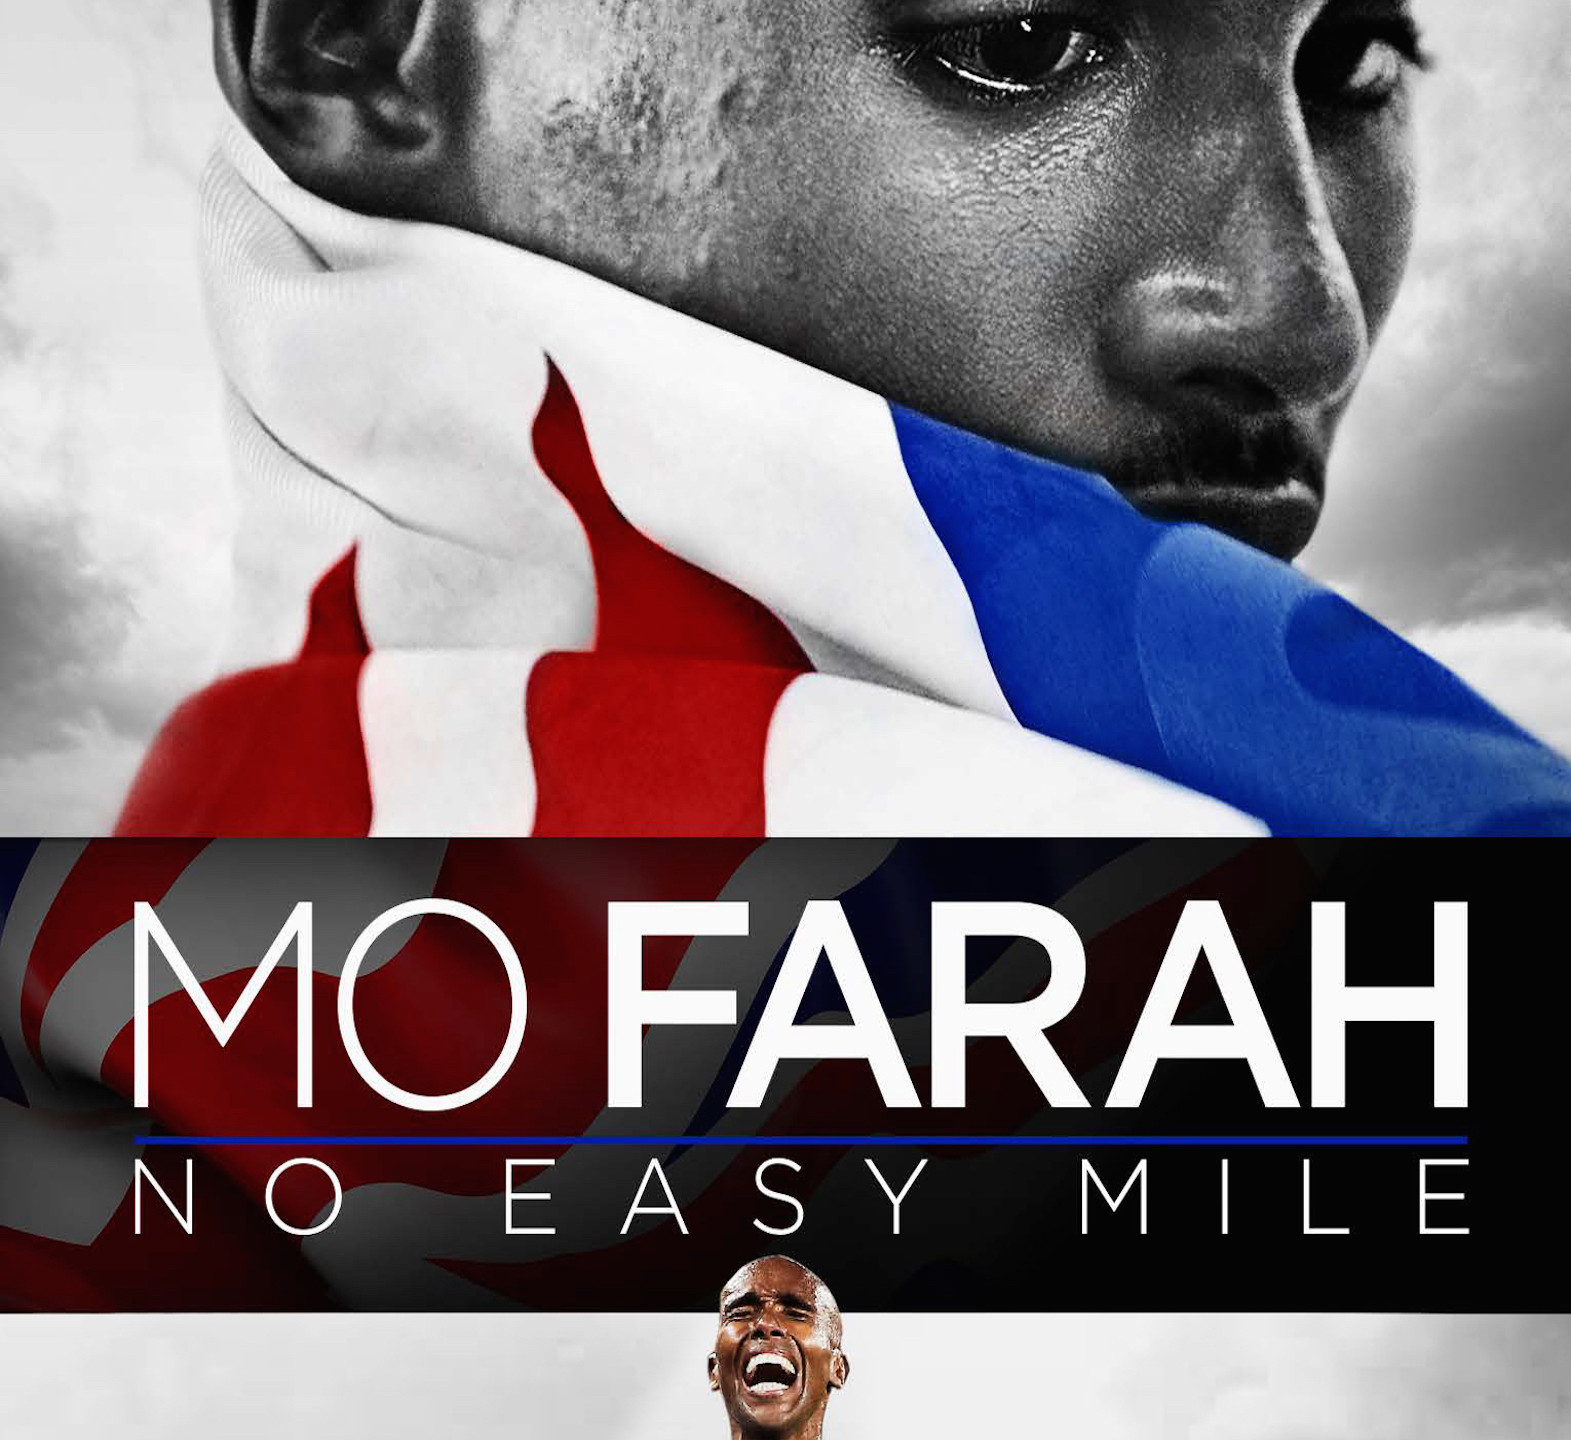 MO_FARAH_DVD_LS STAGE_V6-2